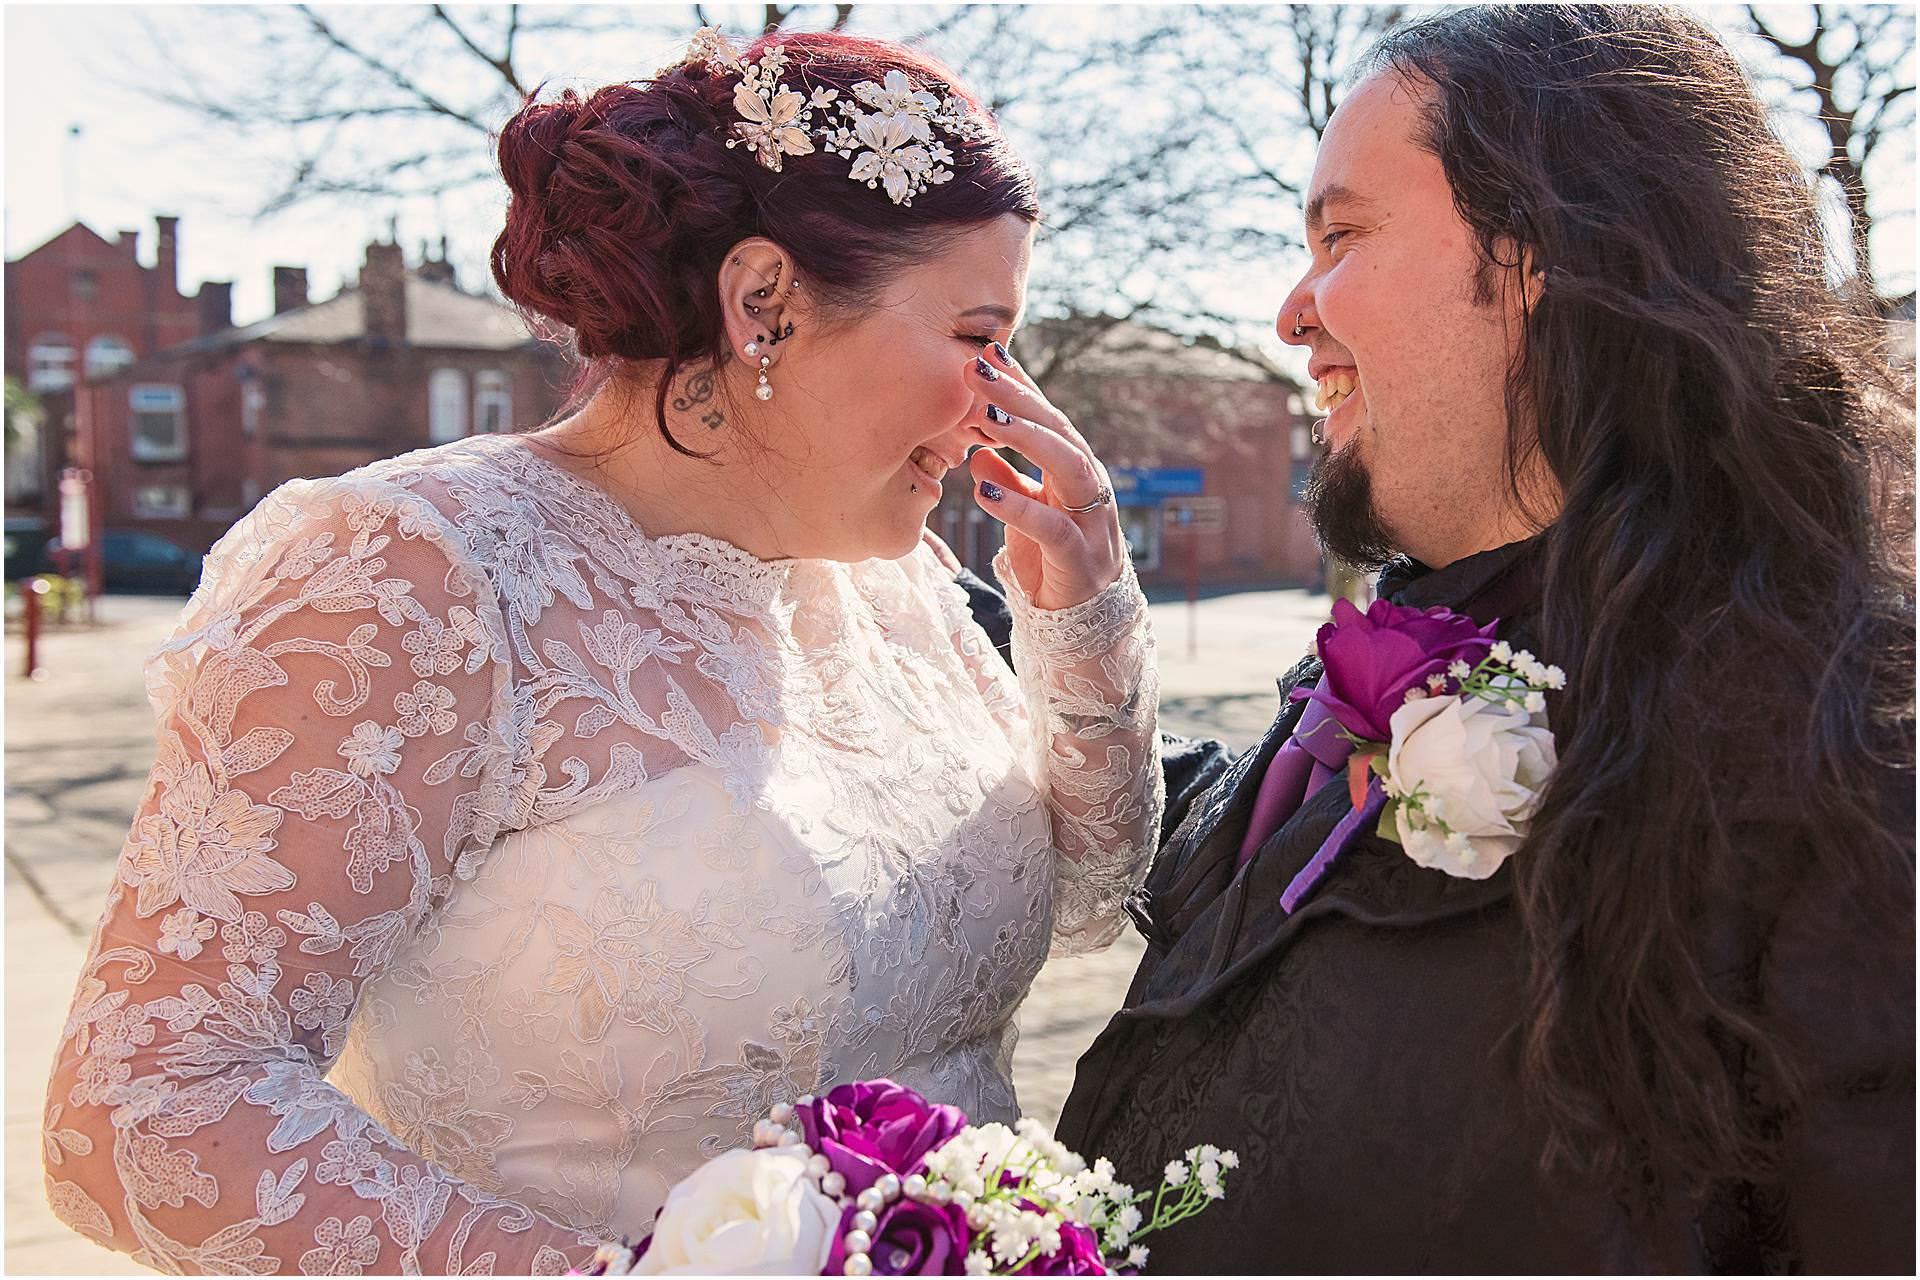 wedding_photography at dukinfield_townhall with sarah_bee_photography dukinfield_park dukinfeild_cheshire_1998.jpg